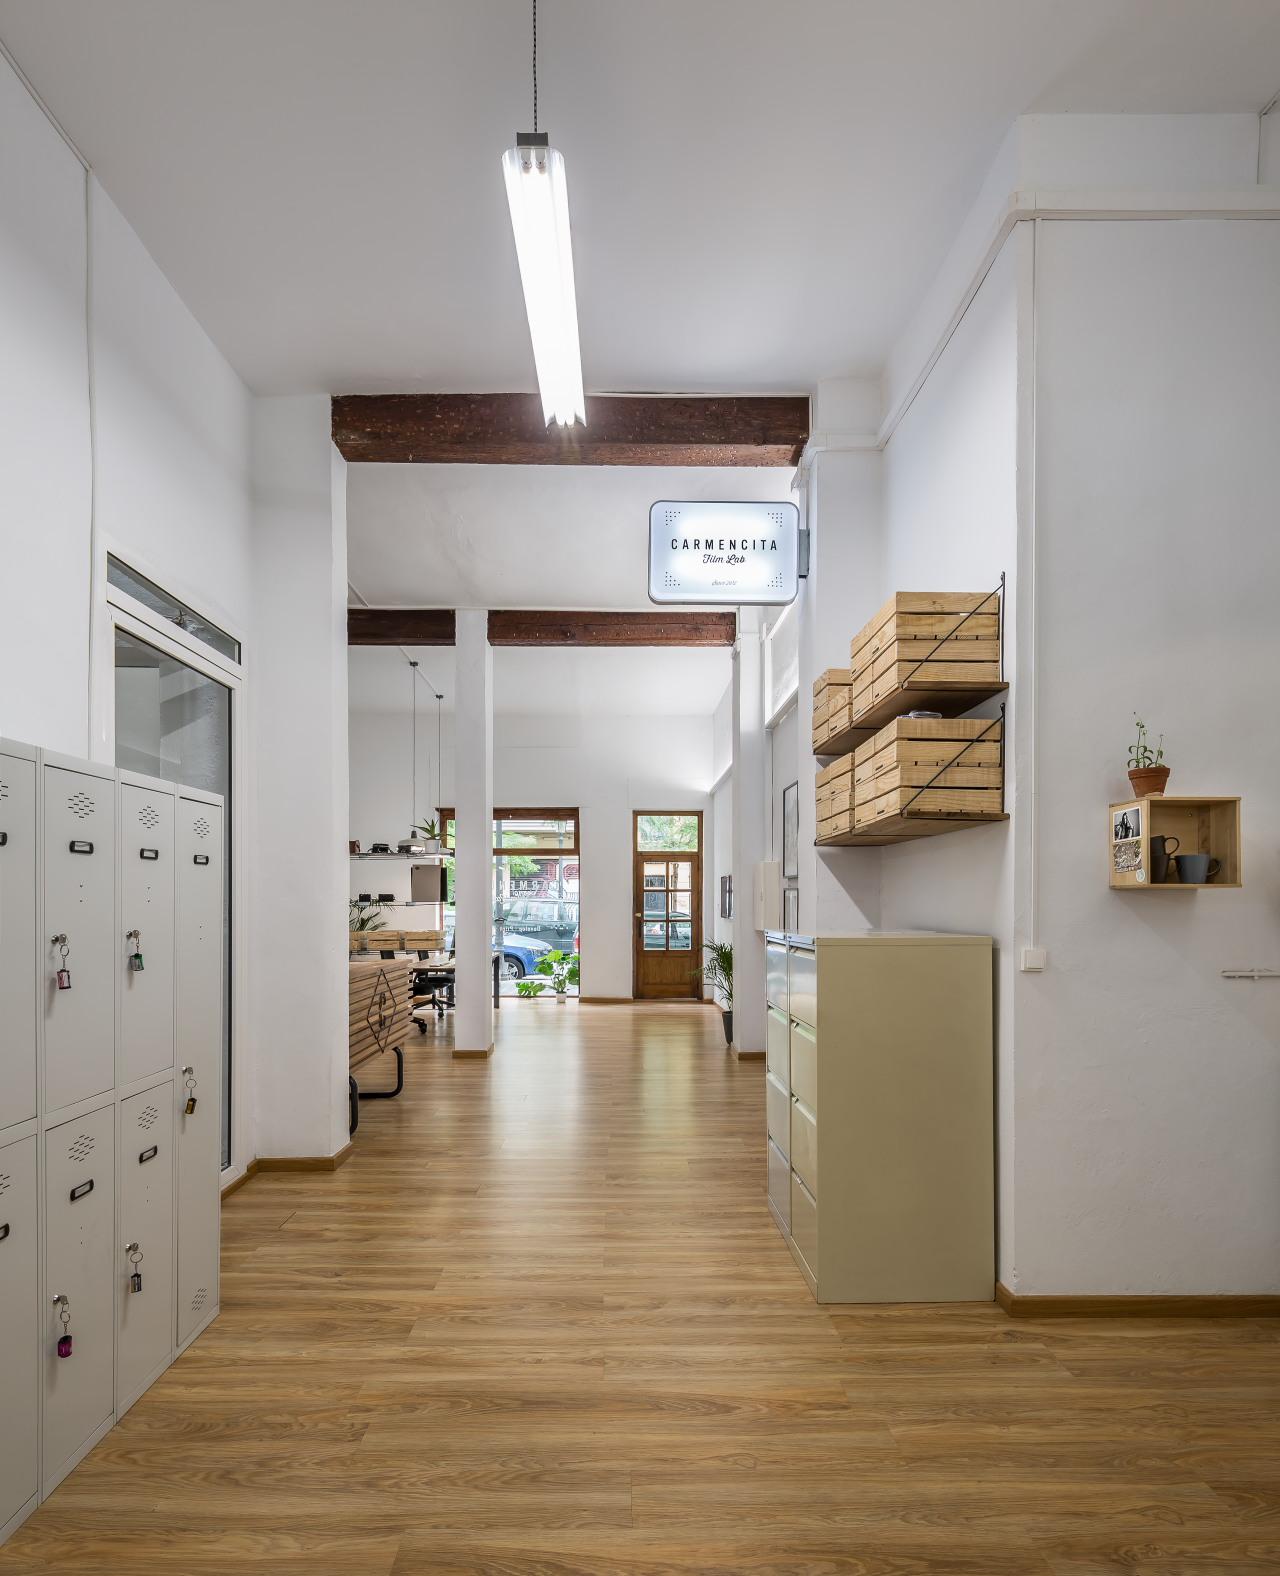 fotografia-arquitectura-interiorismo-valencia-german-cabo-boubau-carmencita-carmencitafilmlab (17)